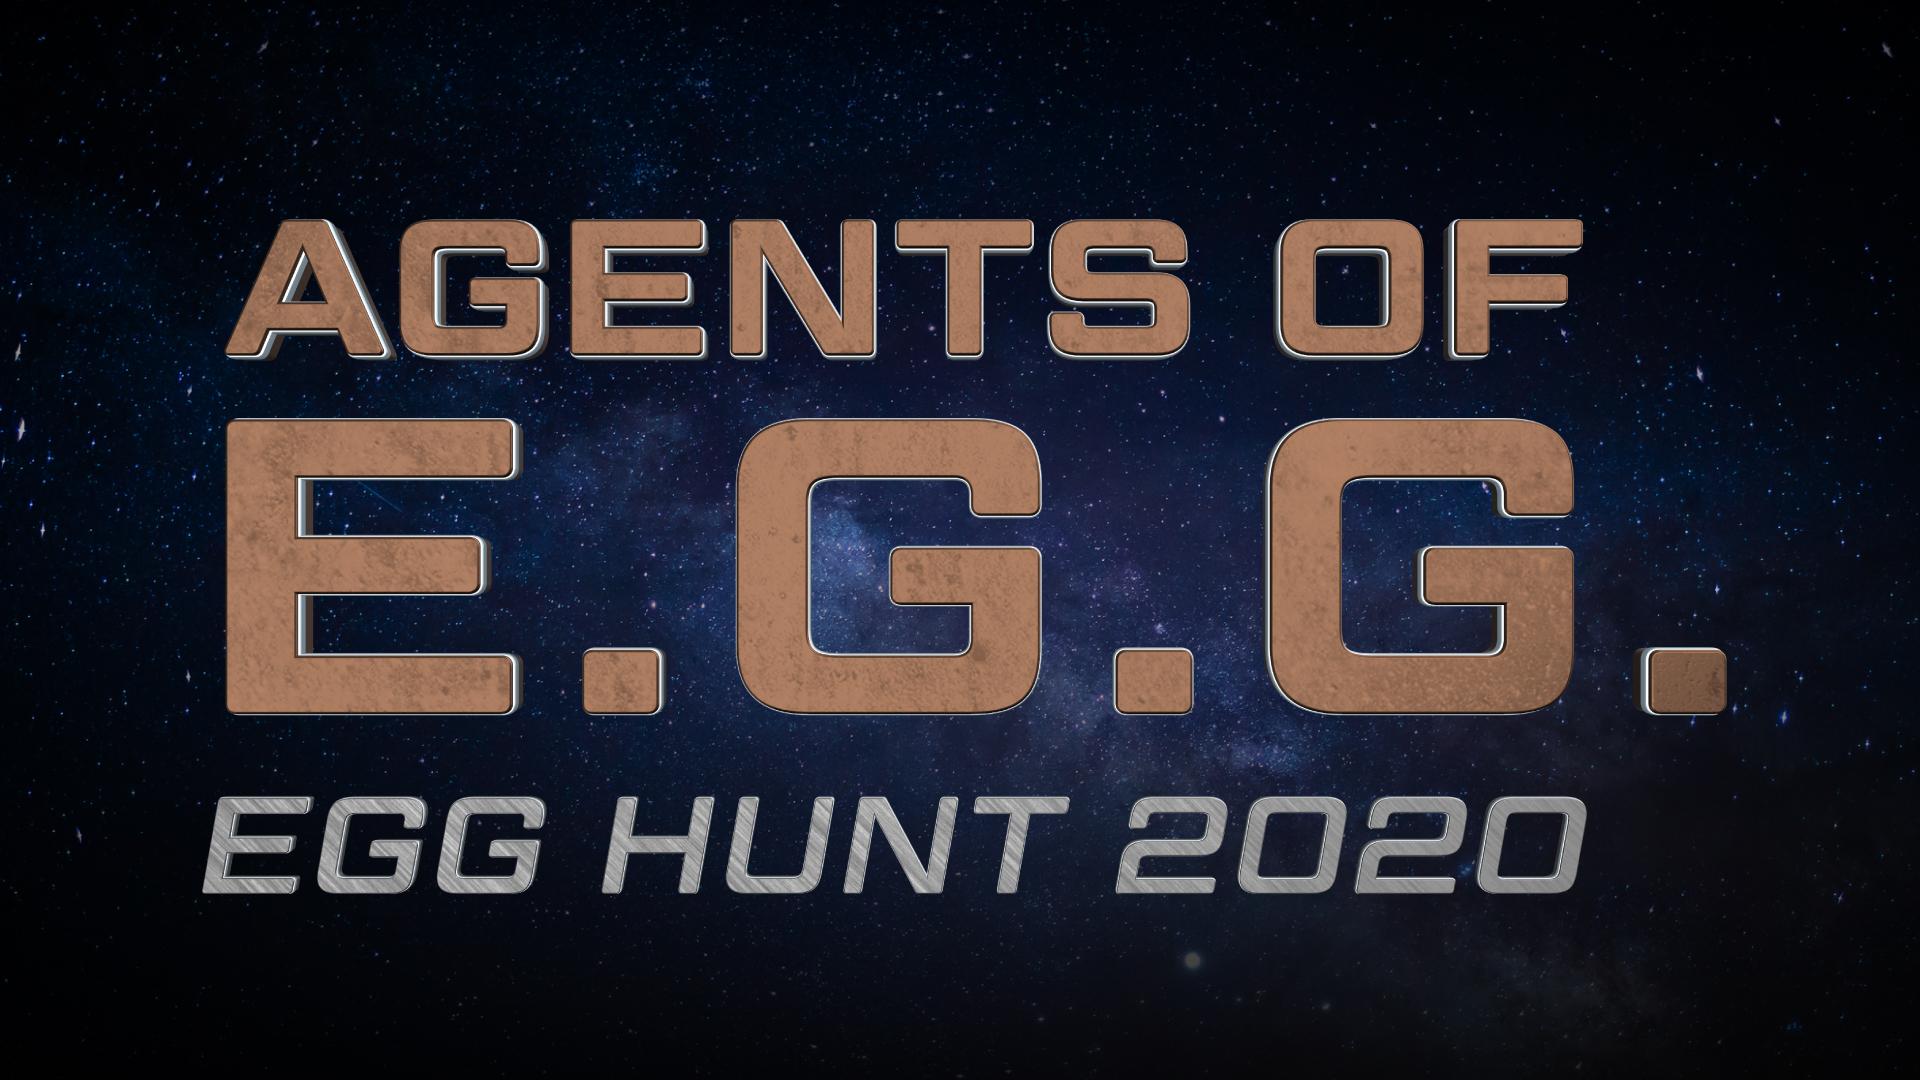 Despacito Spider Roblox Tutorial How Get Free Robux Roblox Egg Hunt 2020 Agents Of E G G Roblox Wikia Fandom